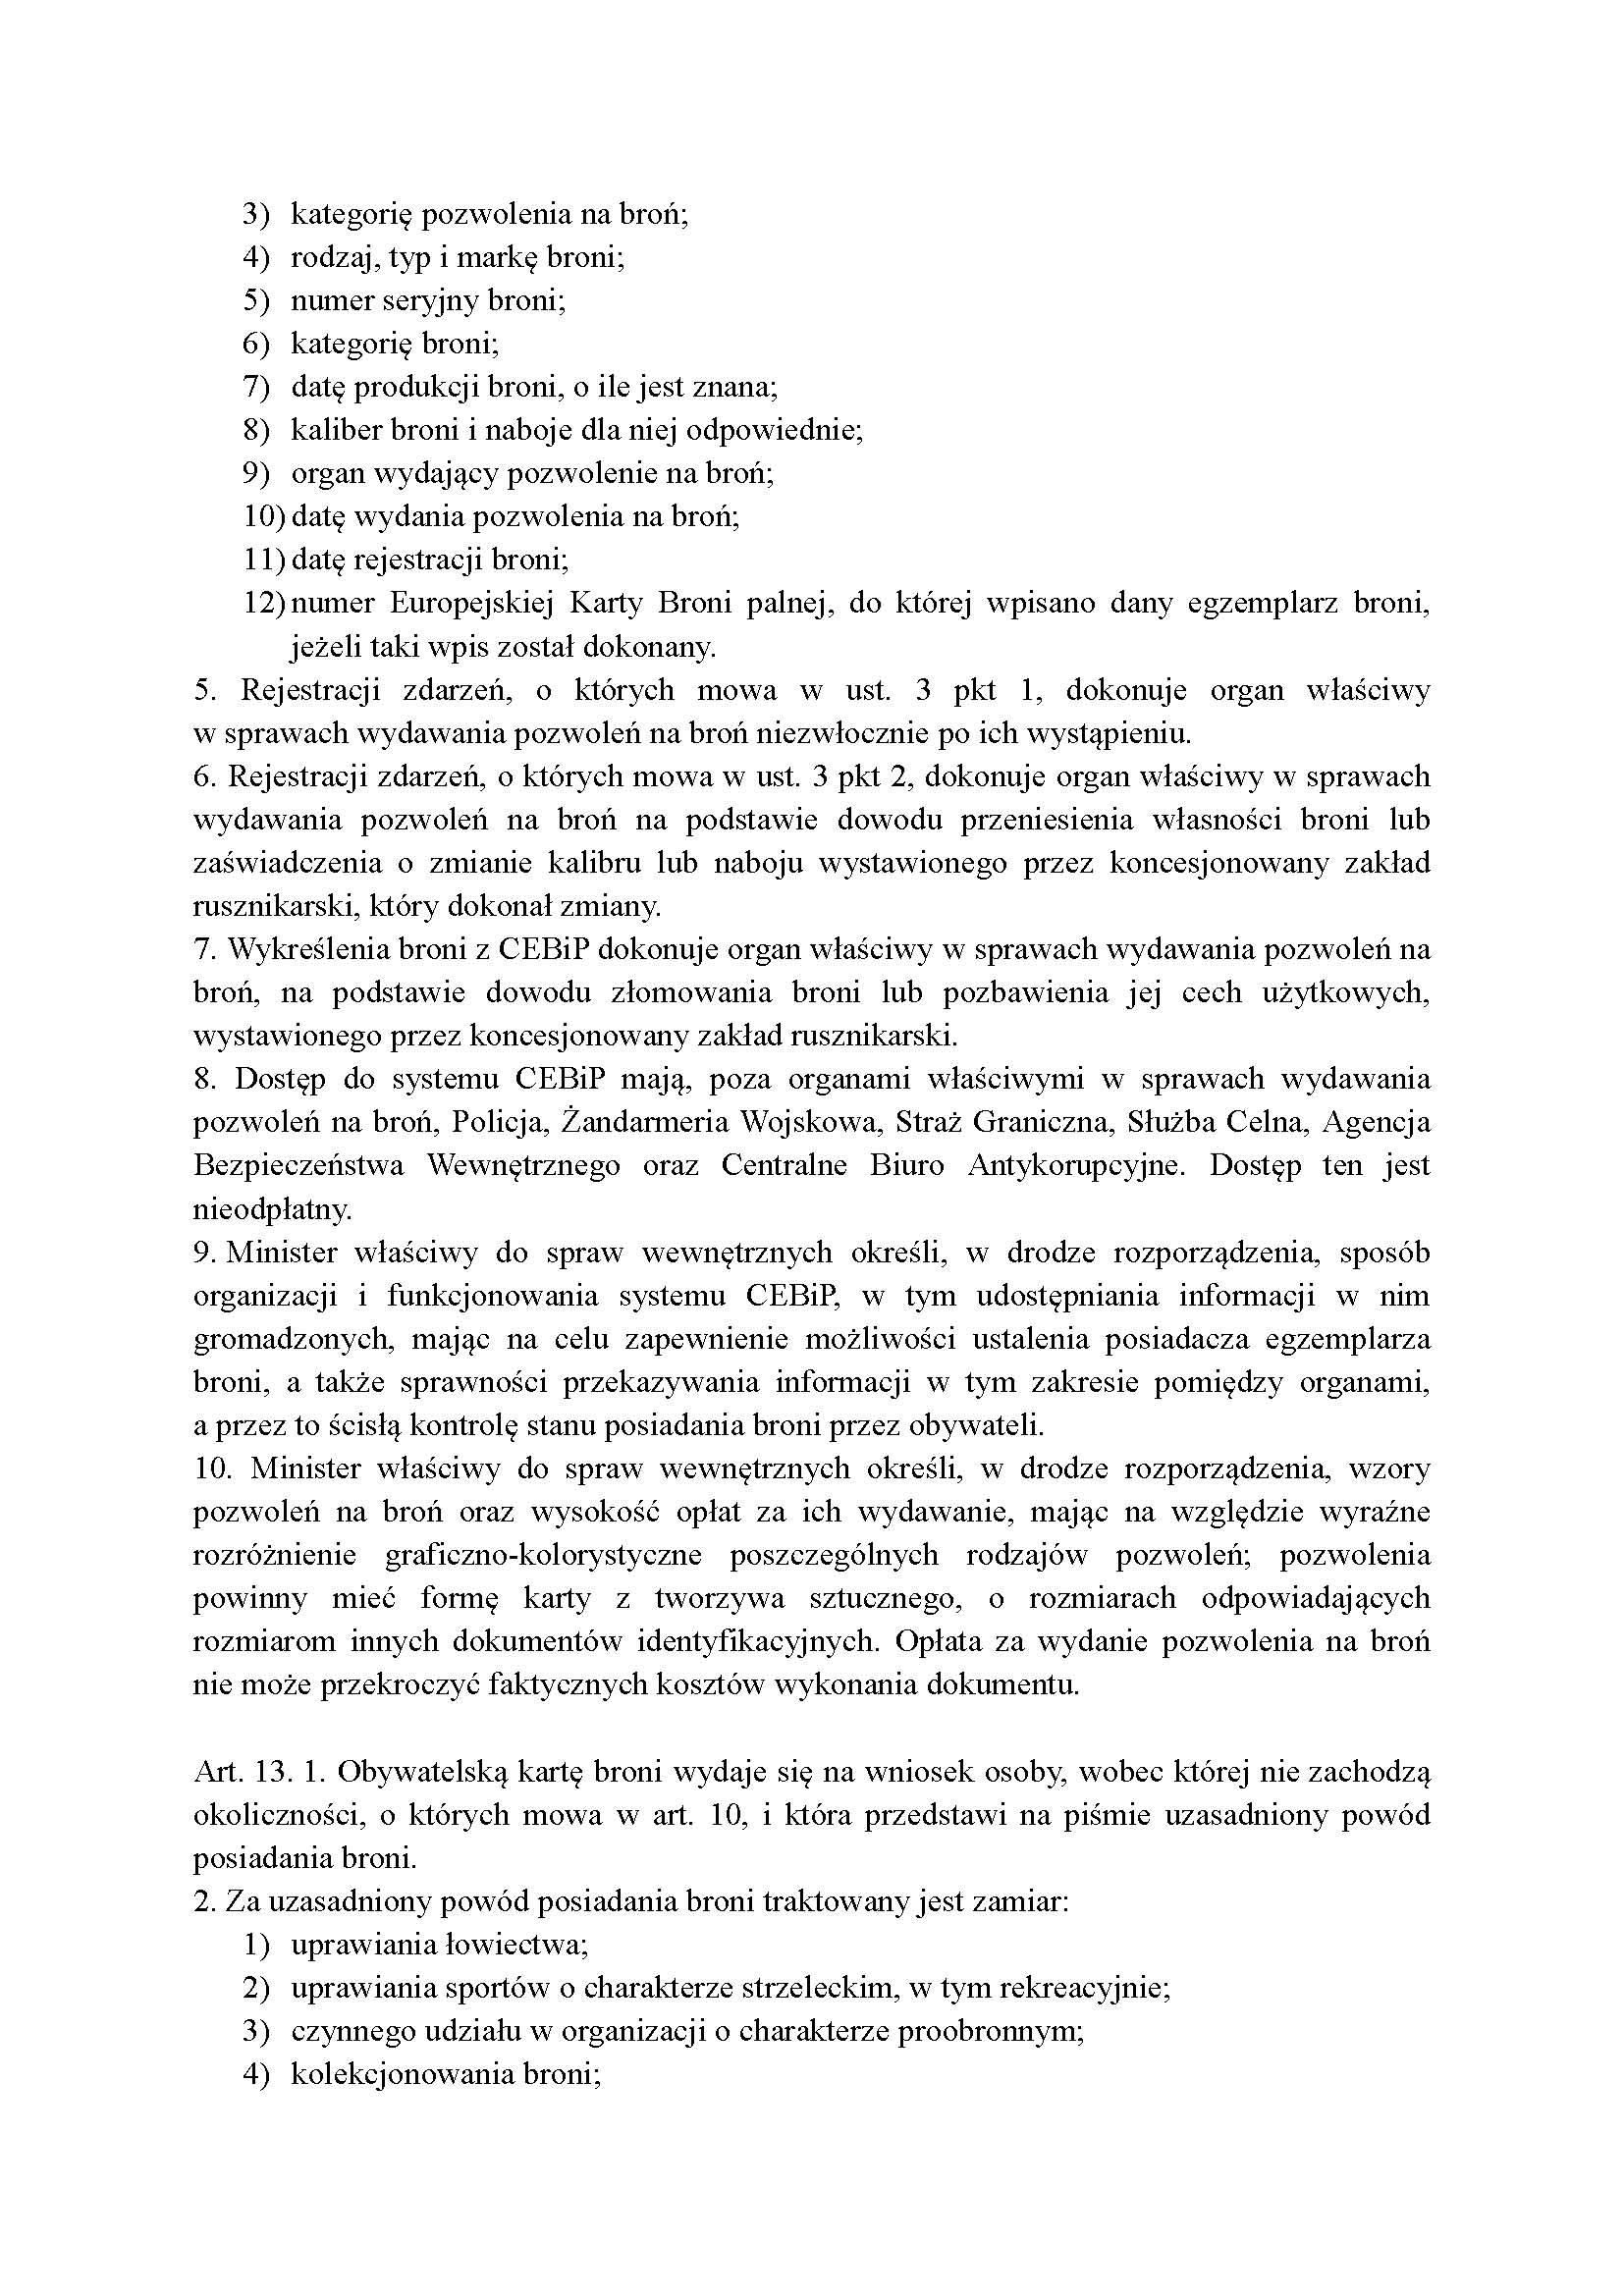 FRSwP_projekt_ustawy_20151125_Strona_07